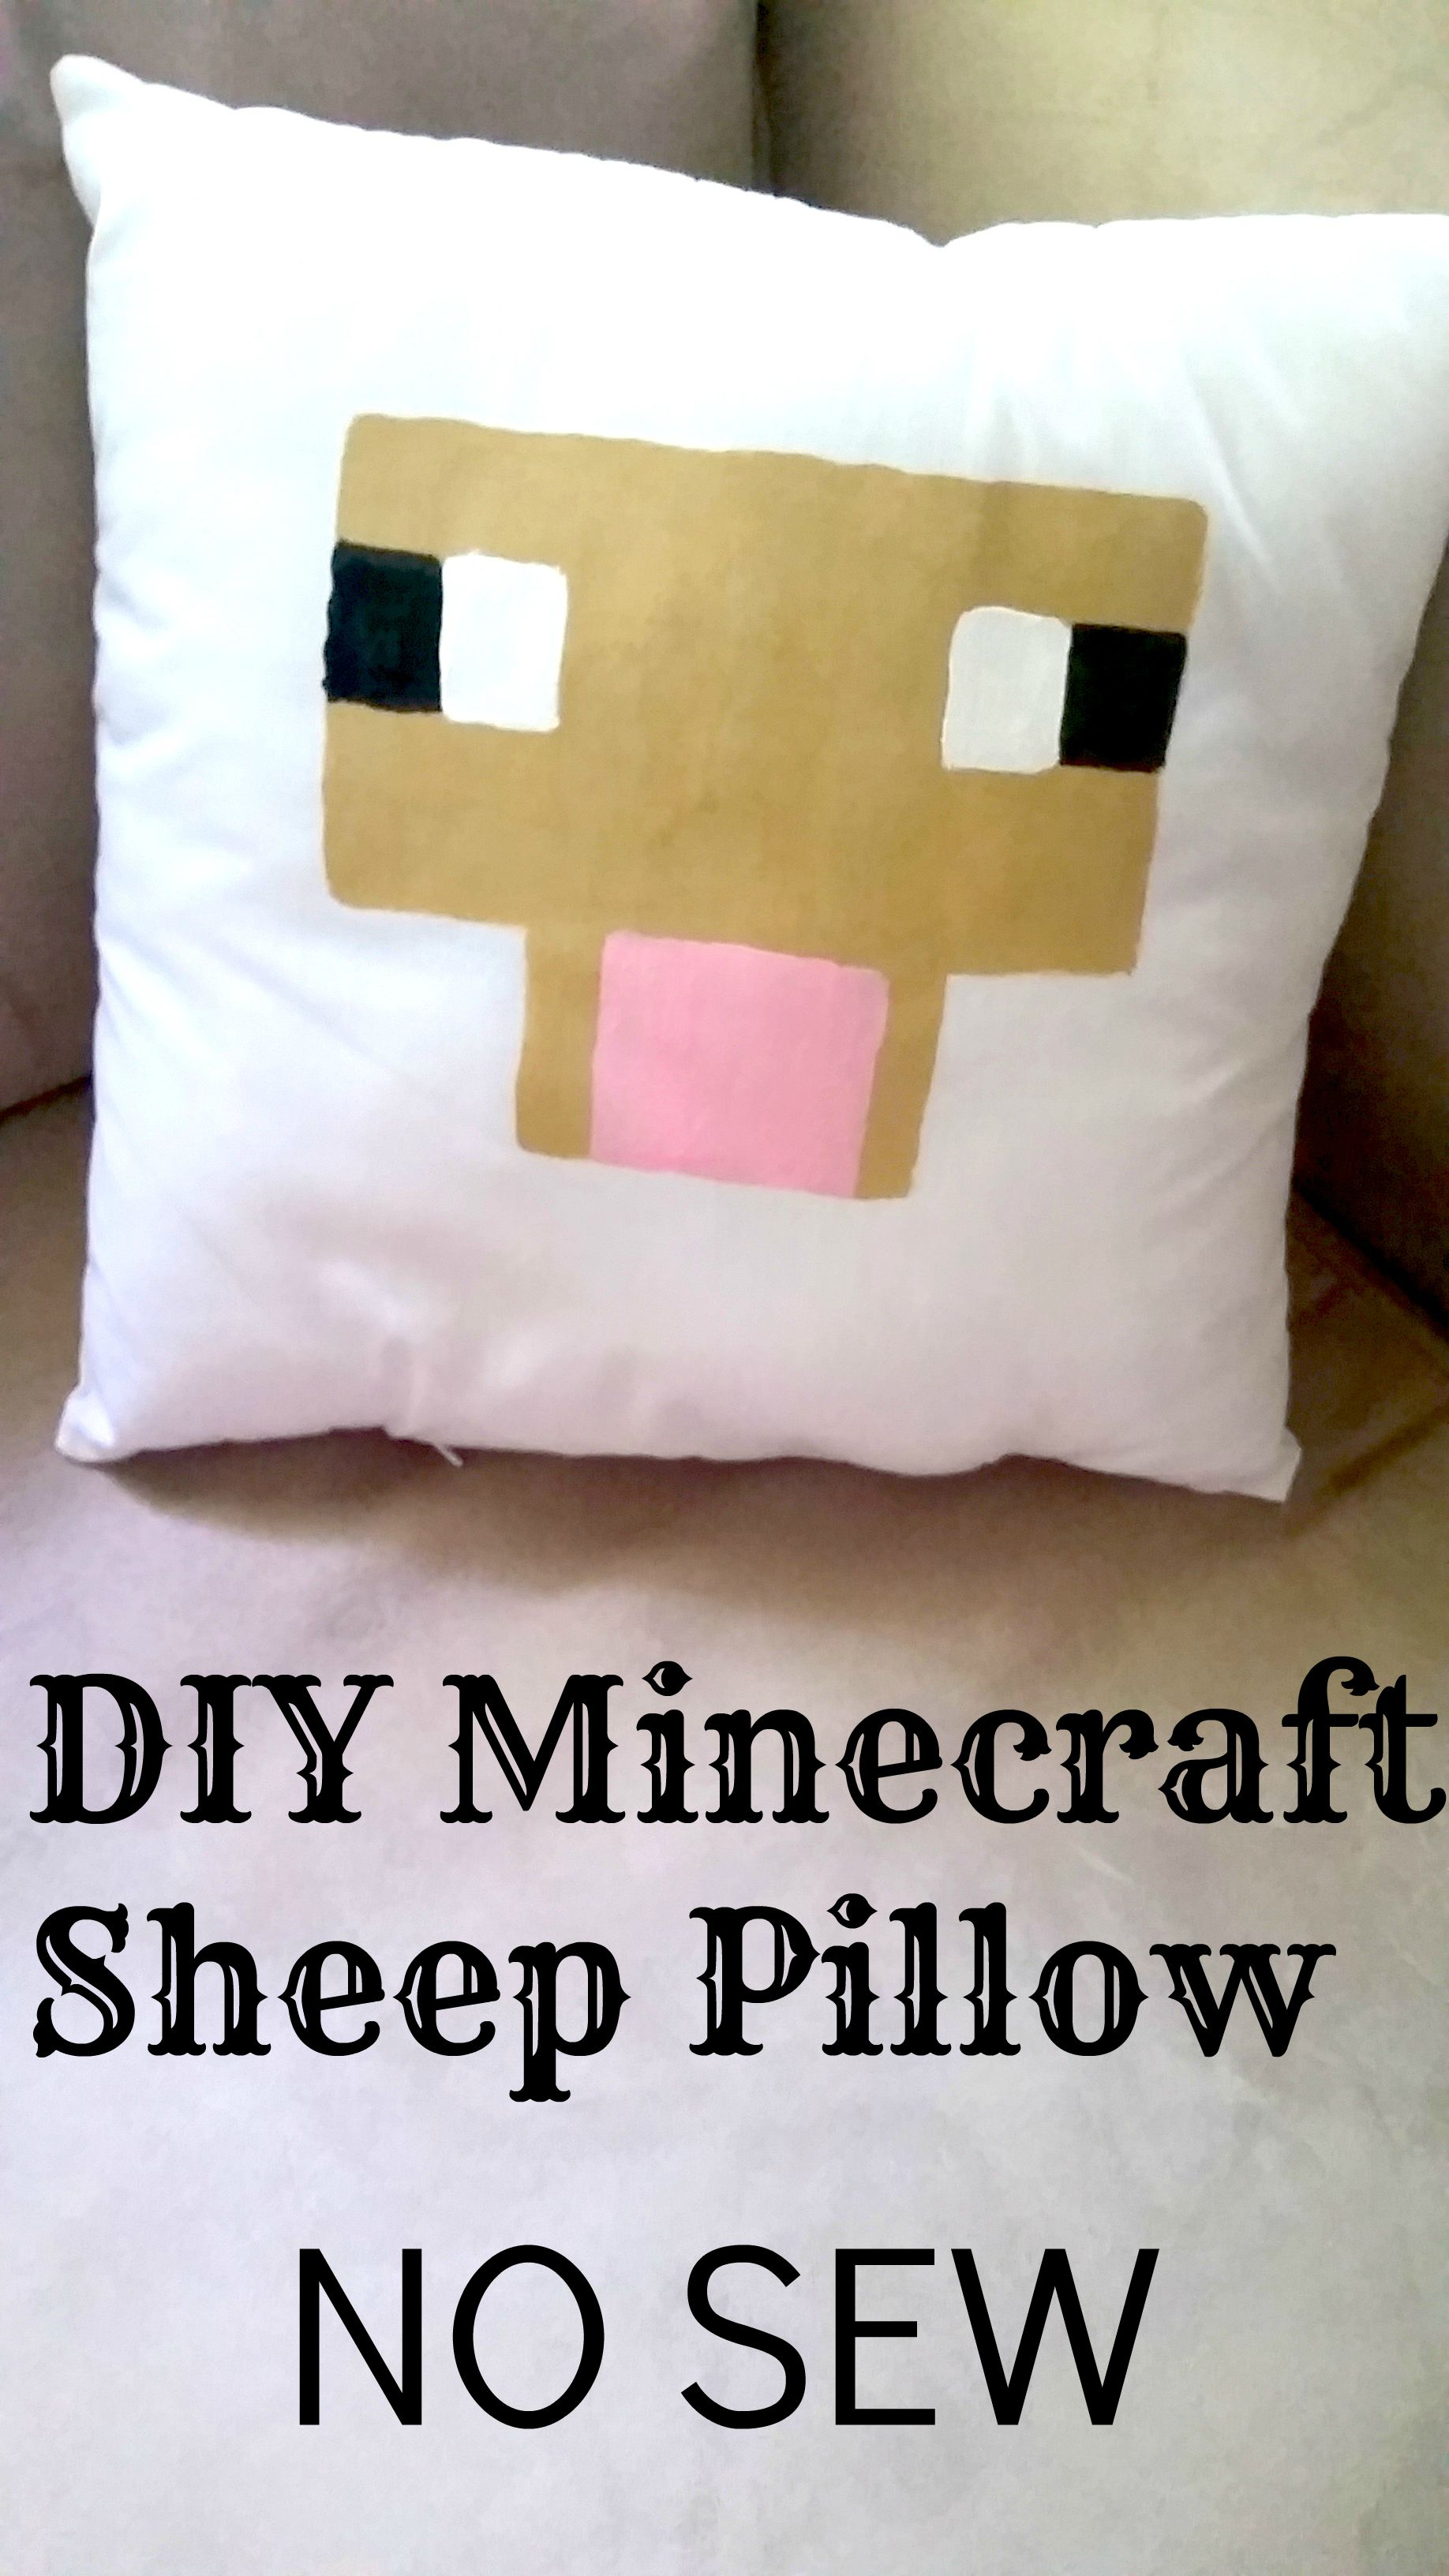 DIY Minecraft Sheep Pillow NO